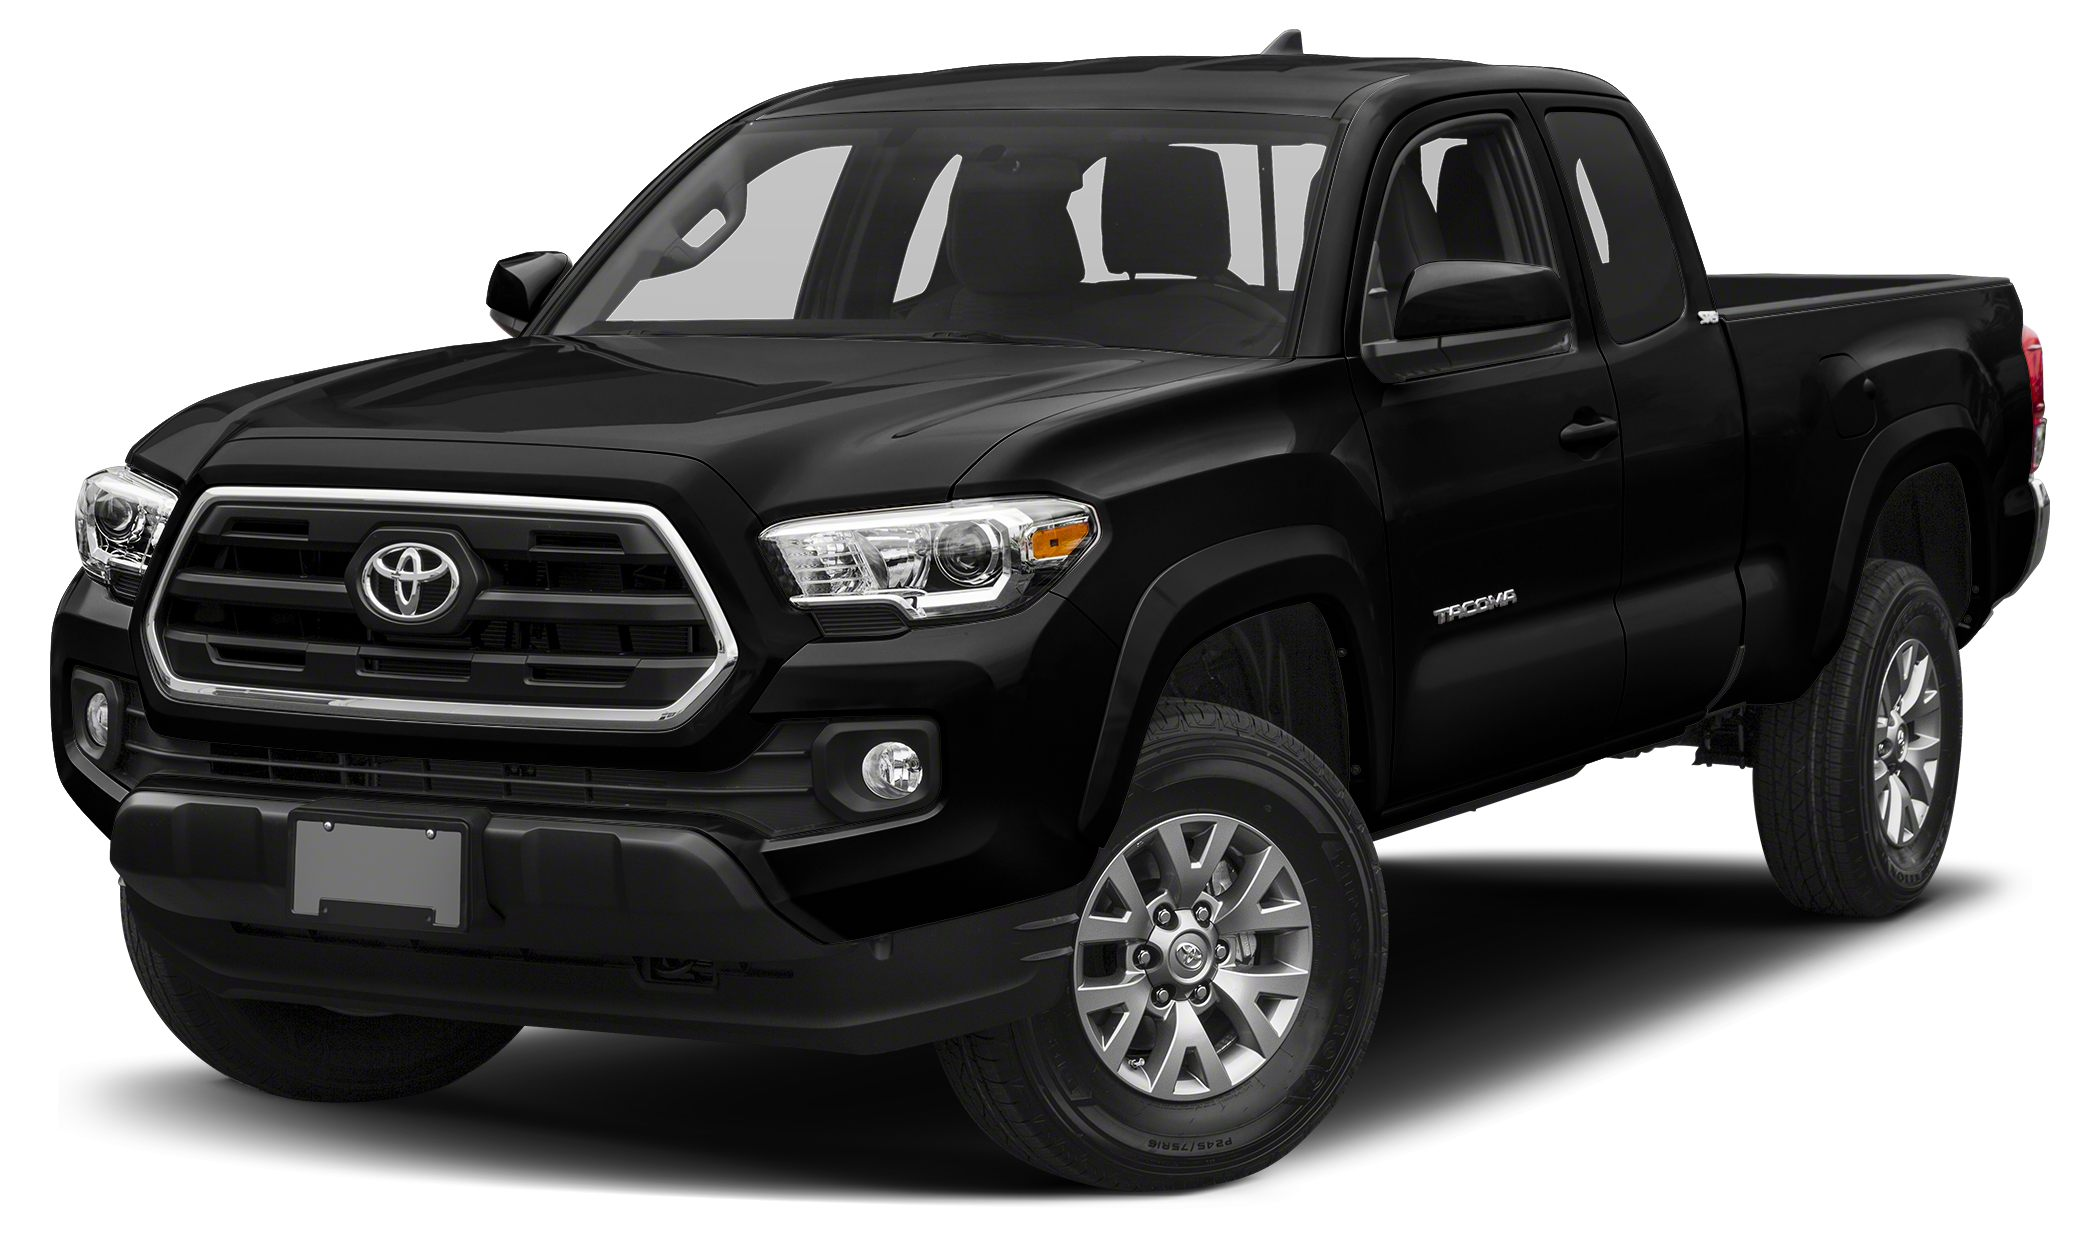 2018 Toyota Tacoma SR5 Midnight Black Metallic SR5 Preferred Owners Portfolio 4WD All Weather F